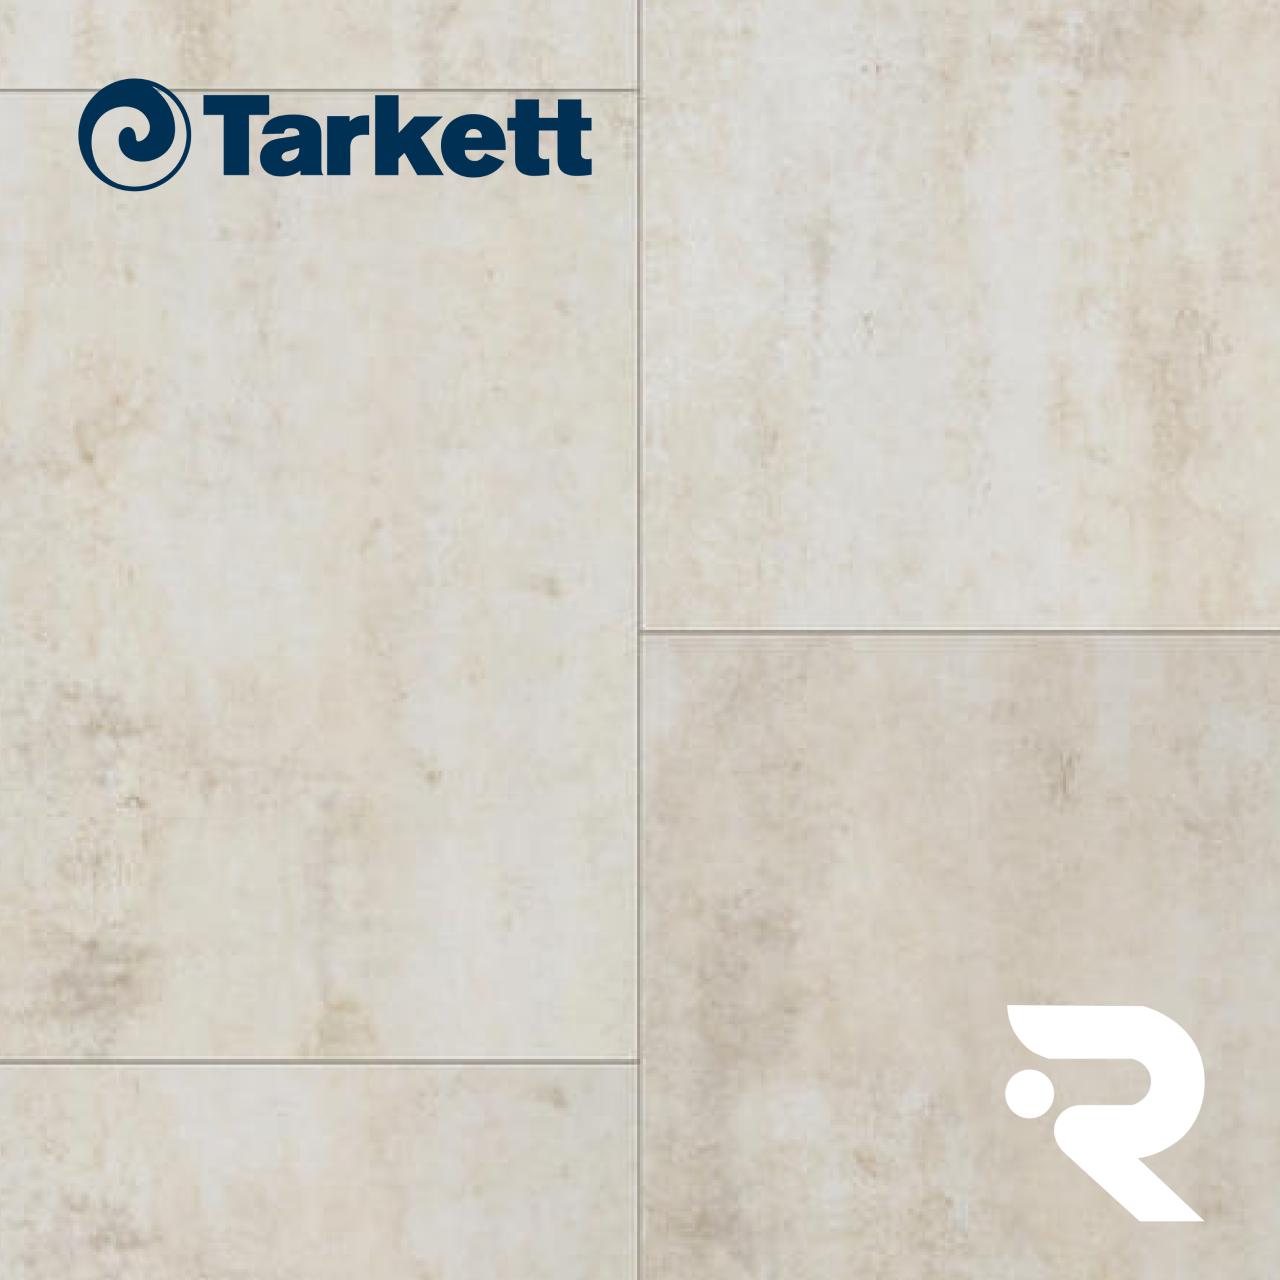 🌳 ПВХ плитка Tarkett | LOUNGE - CHILL | Art Vinyl | 457 x 457 мм